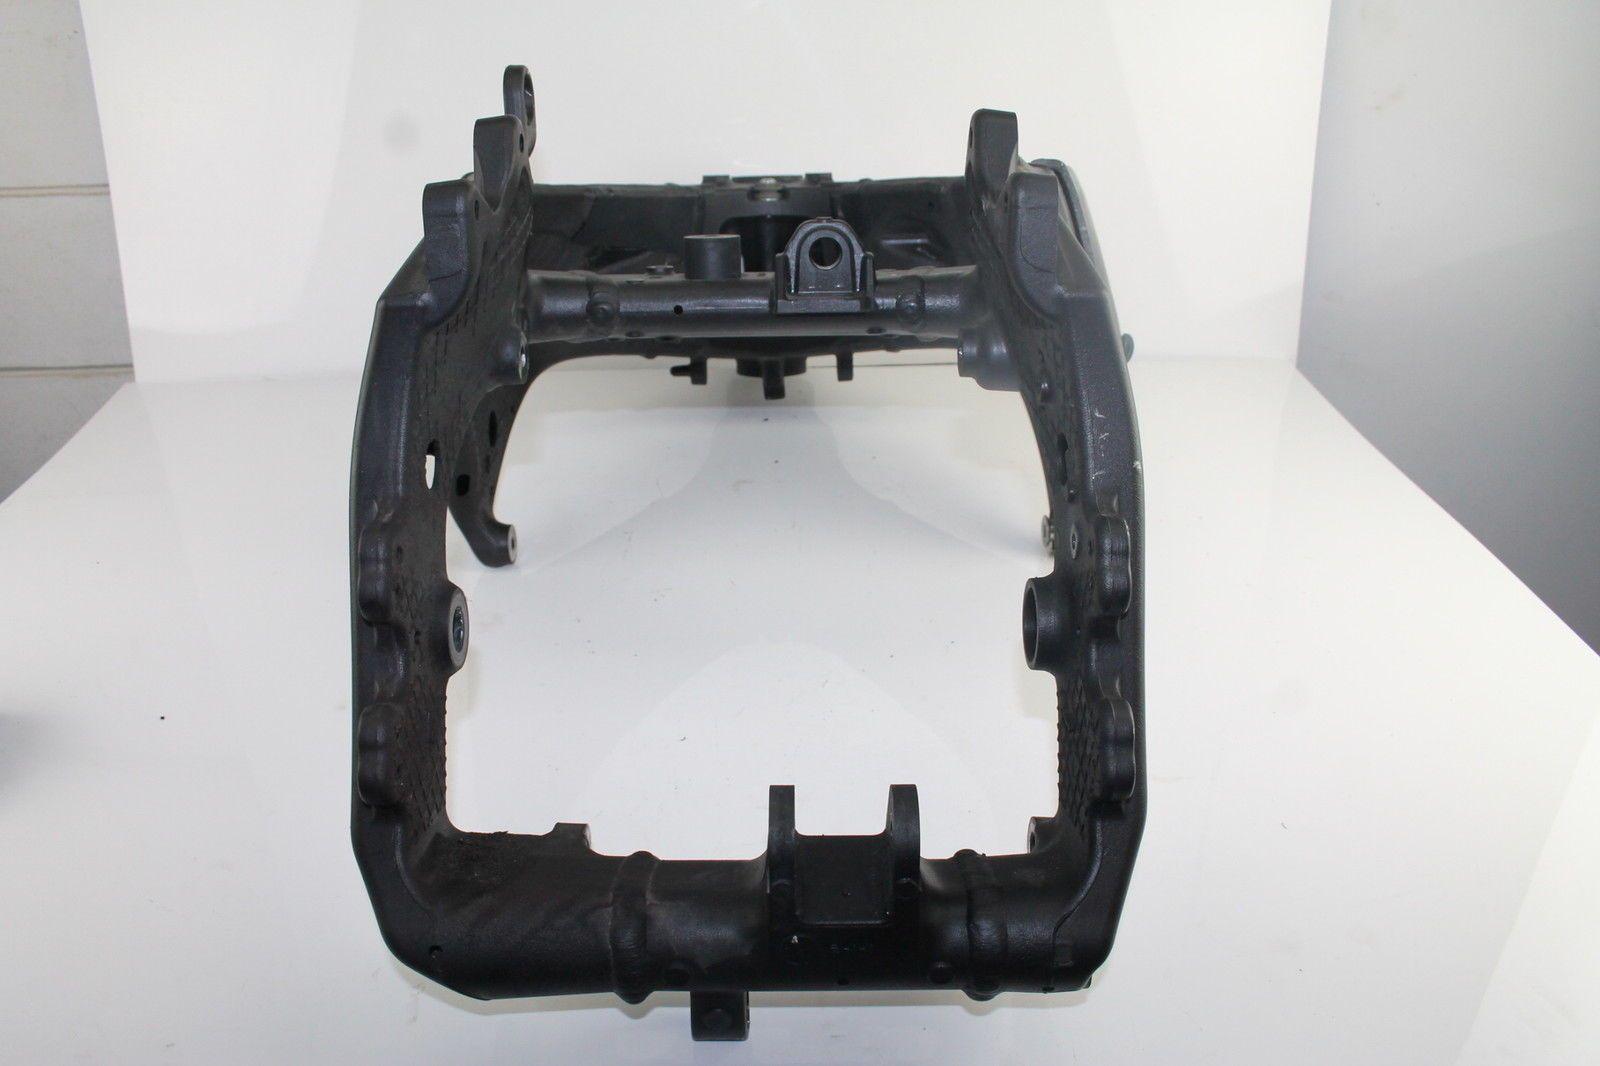 11-15 KAWASAKI NINJA ZX10 ZX10R Main Frame Chassis CRACKED. CD ...